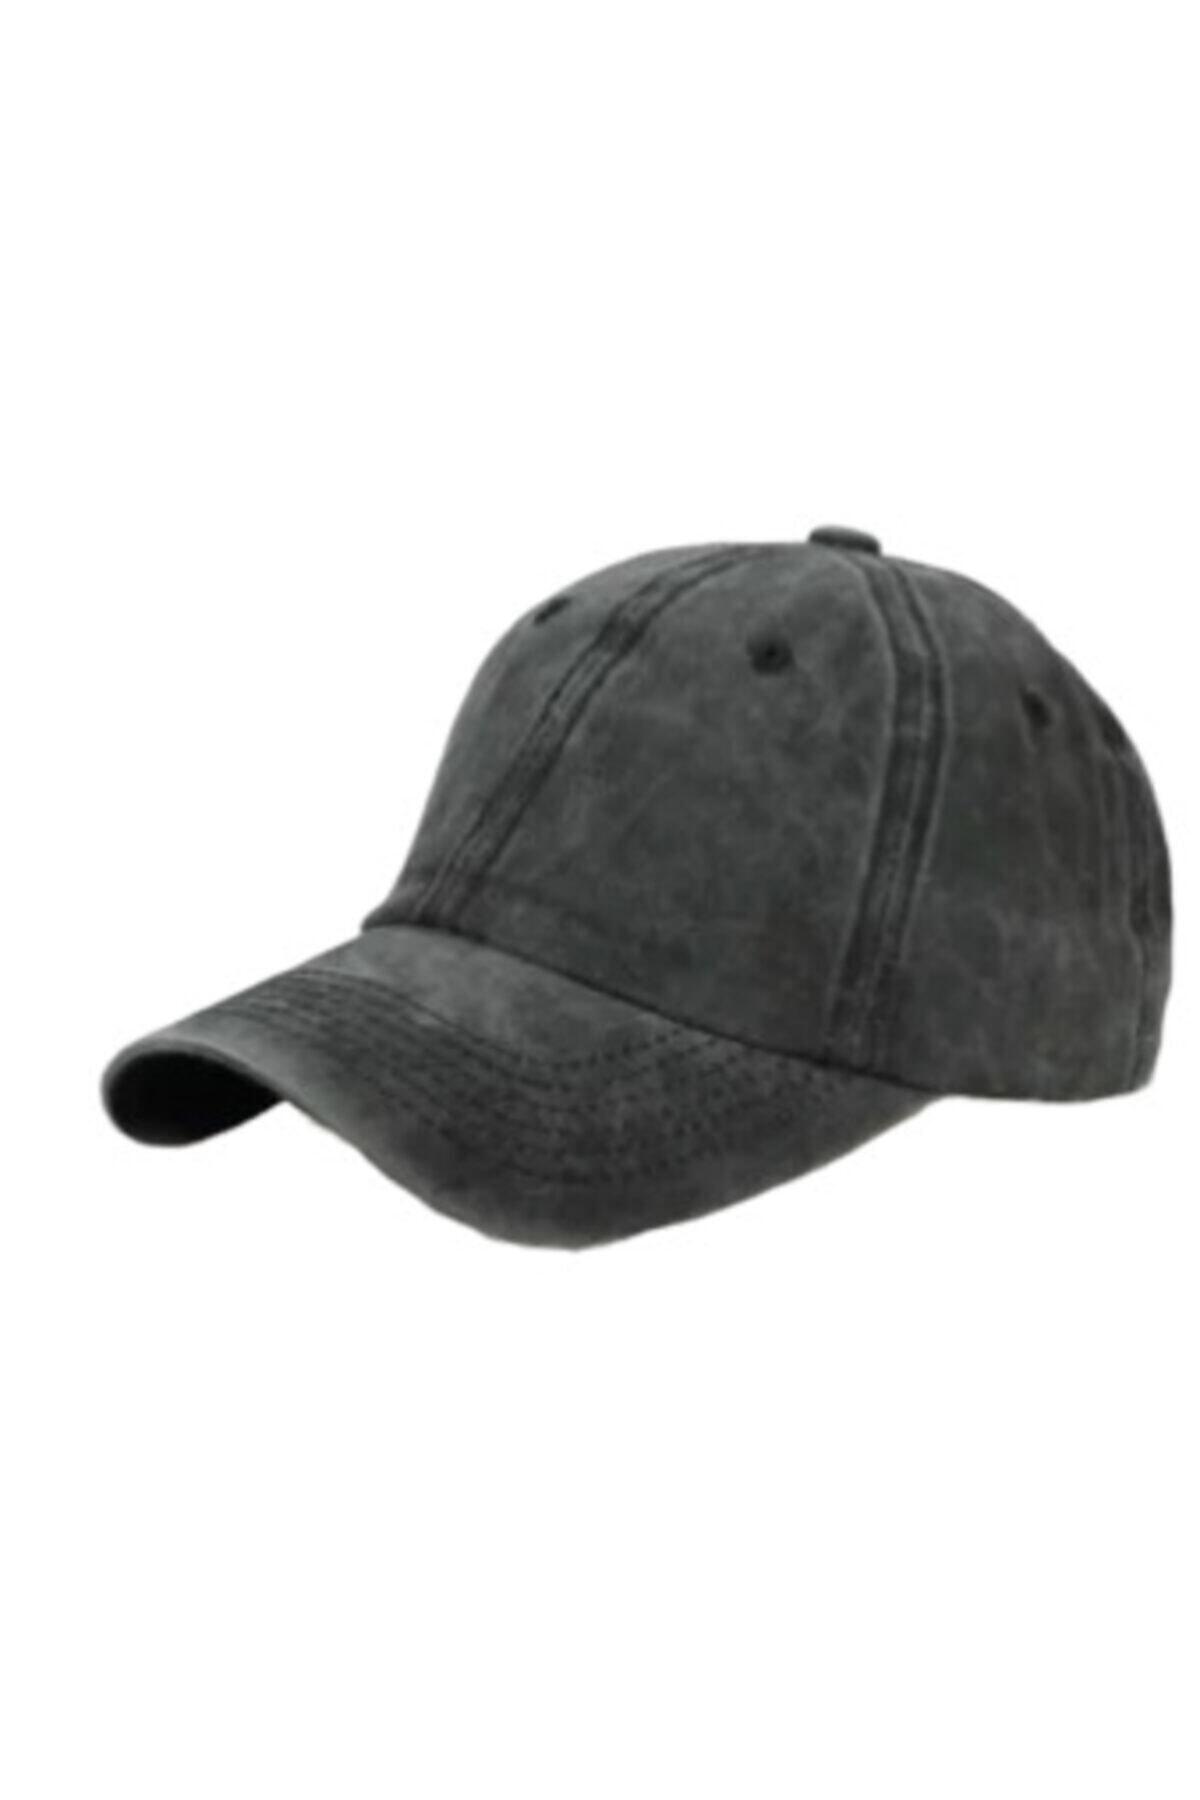 Eskitme Şapka Modeli